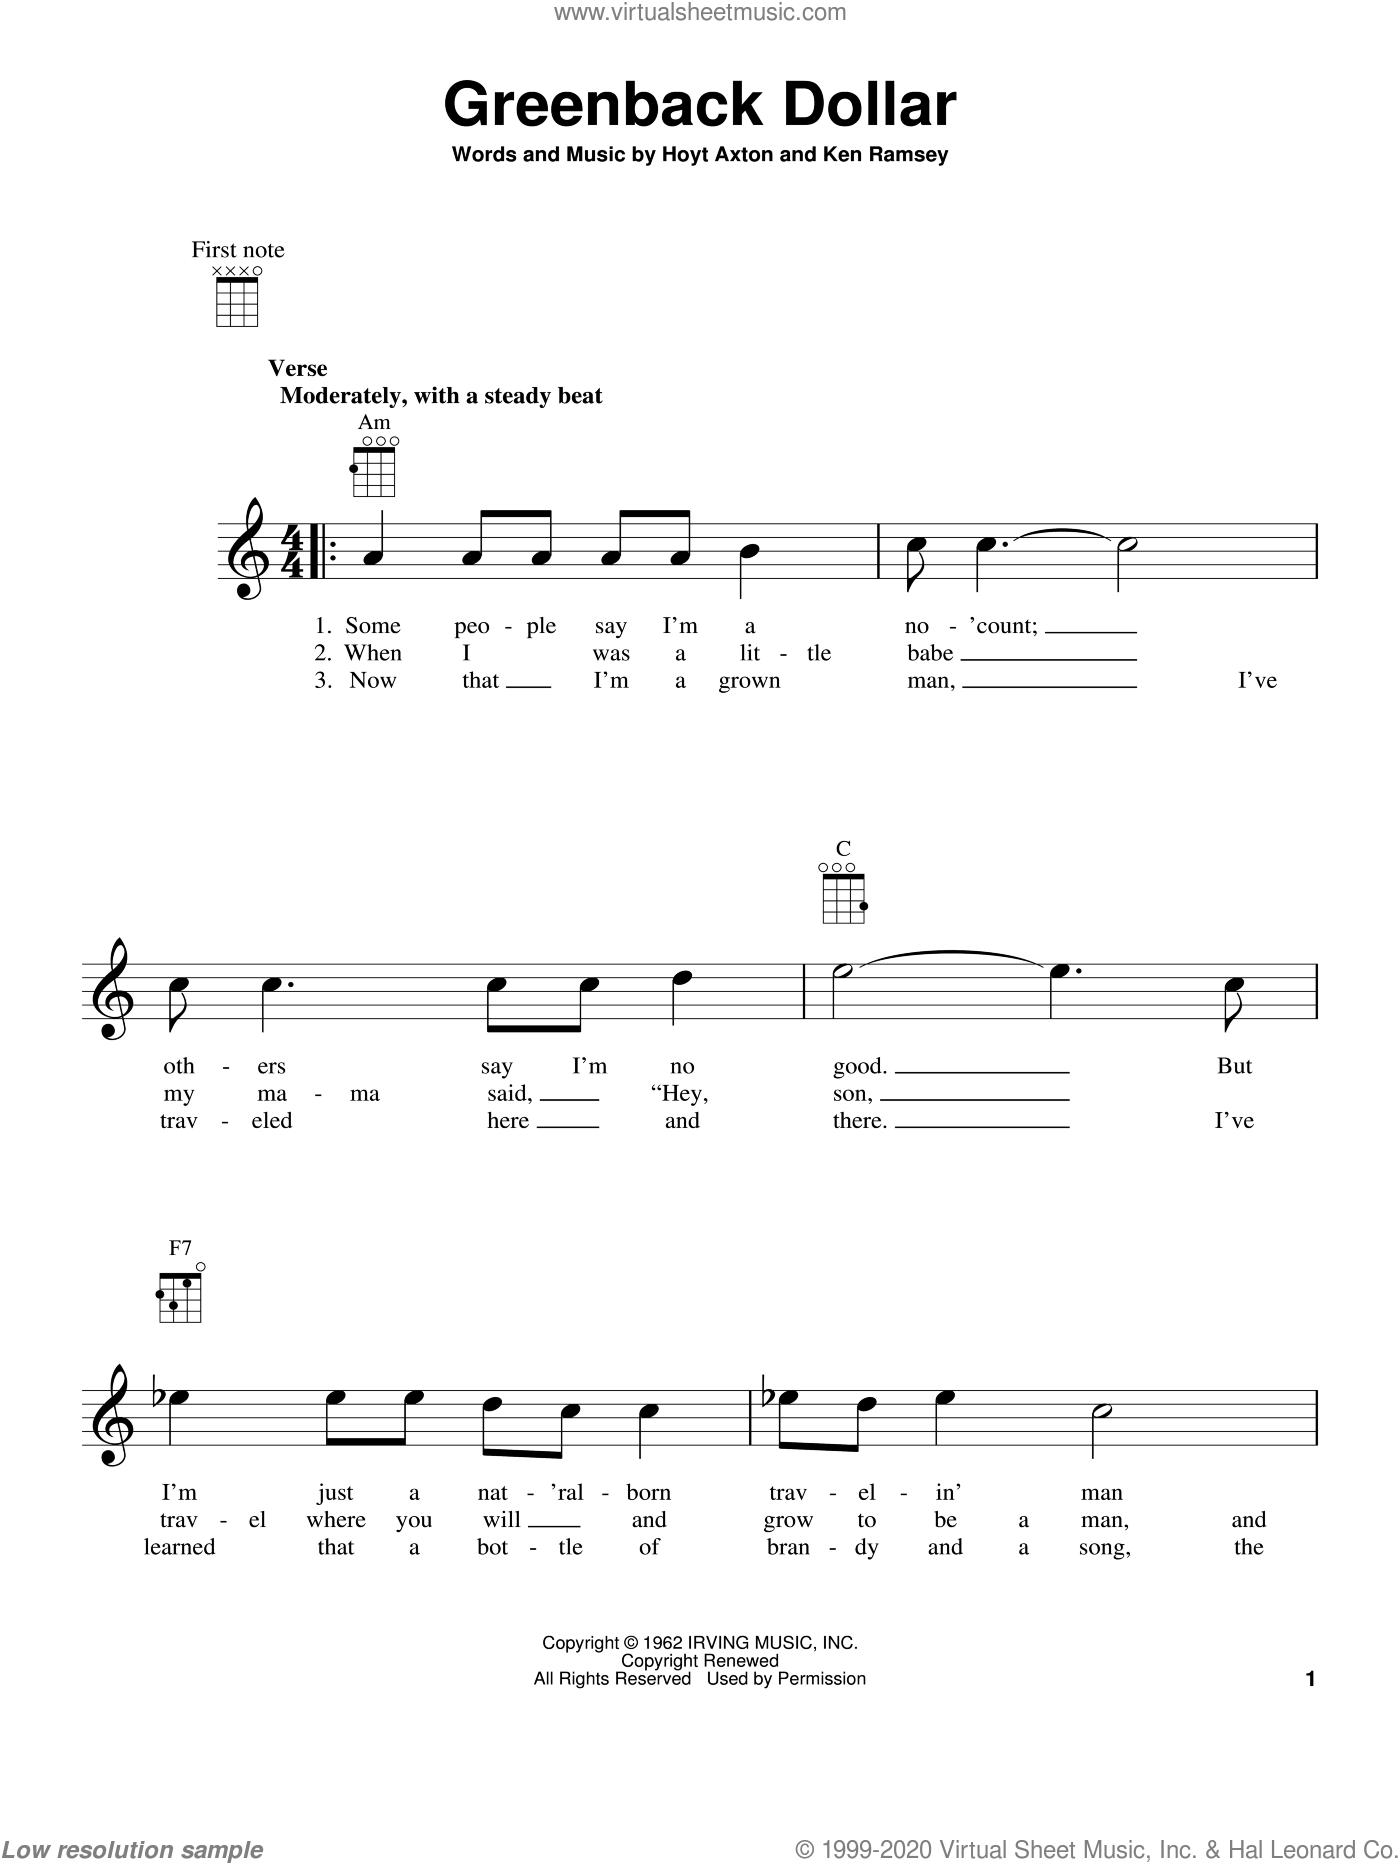 Greenback Dollar sheet music for ukulele by Kingston Trio, Hoyt Axton and Ken Ramsey, intermediate skill level